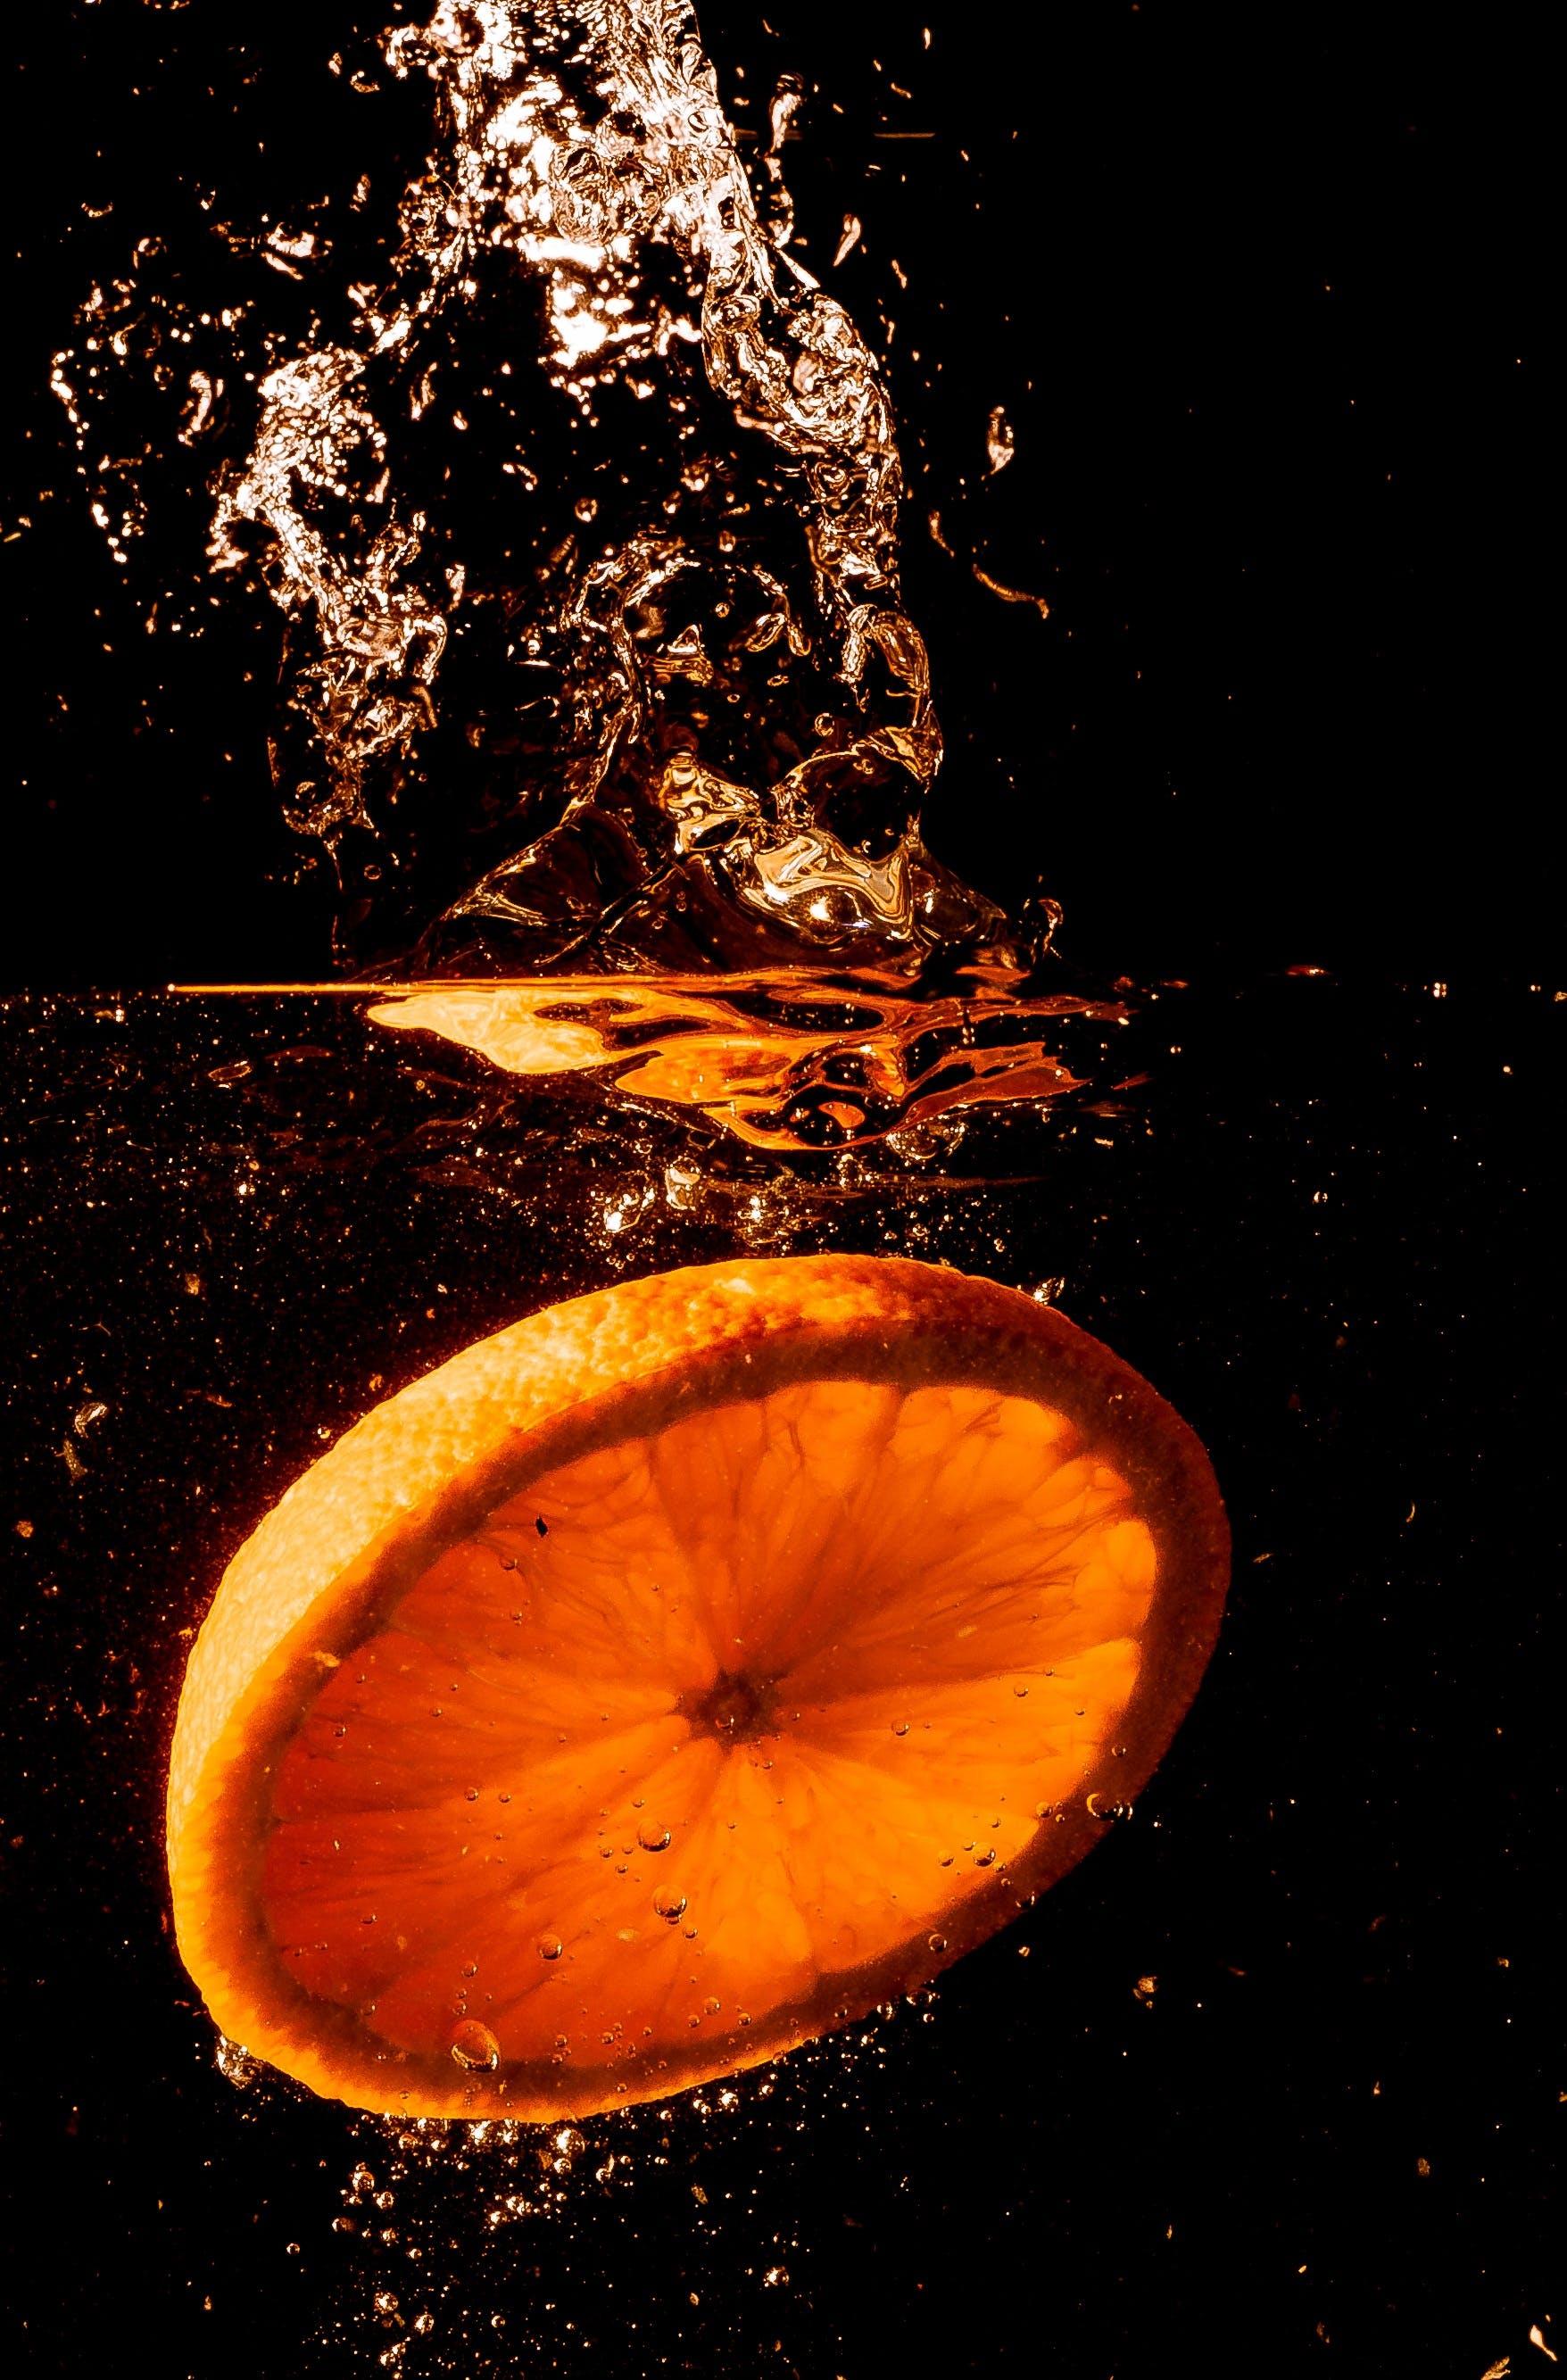 Free stock photo of food, water, drink, orange